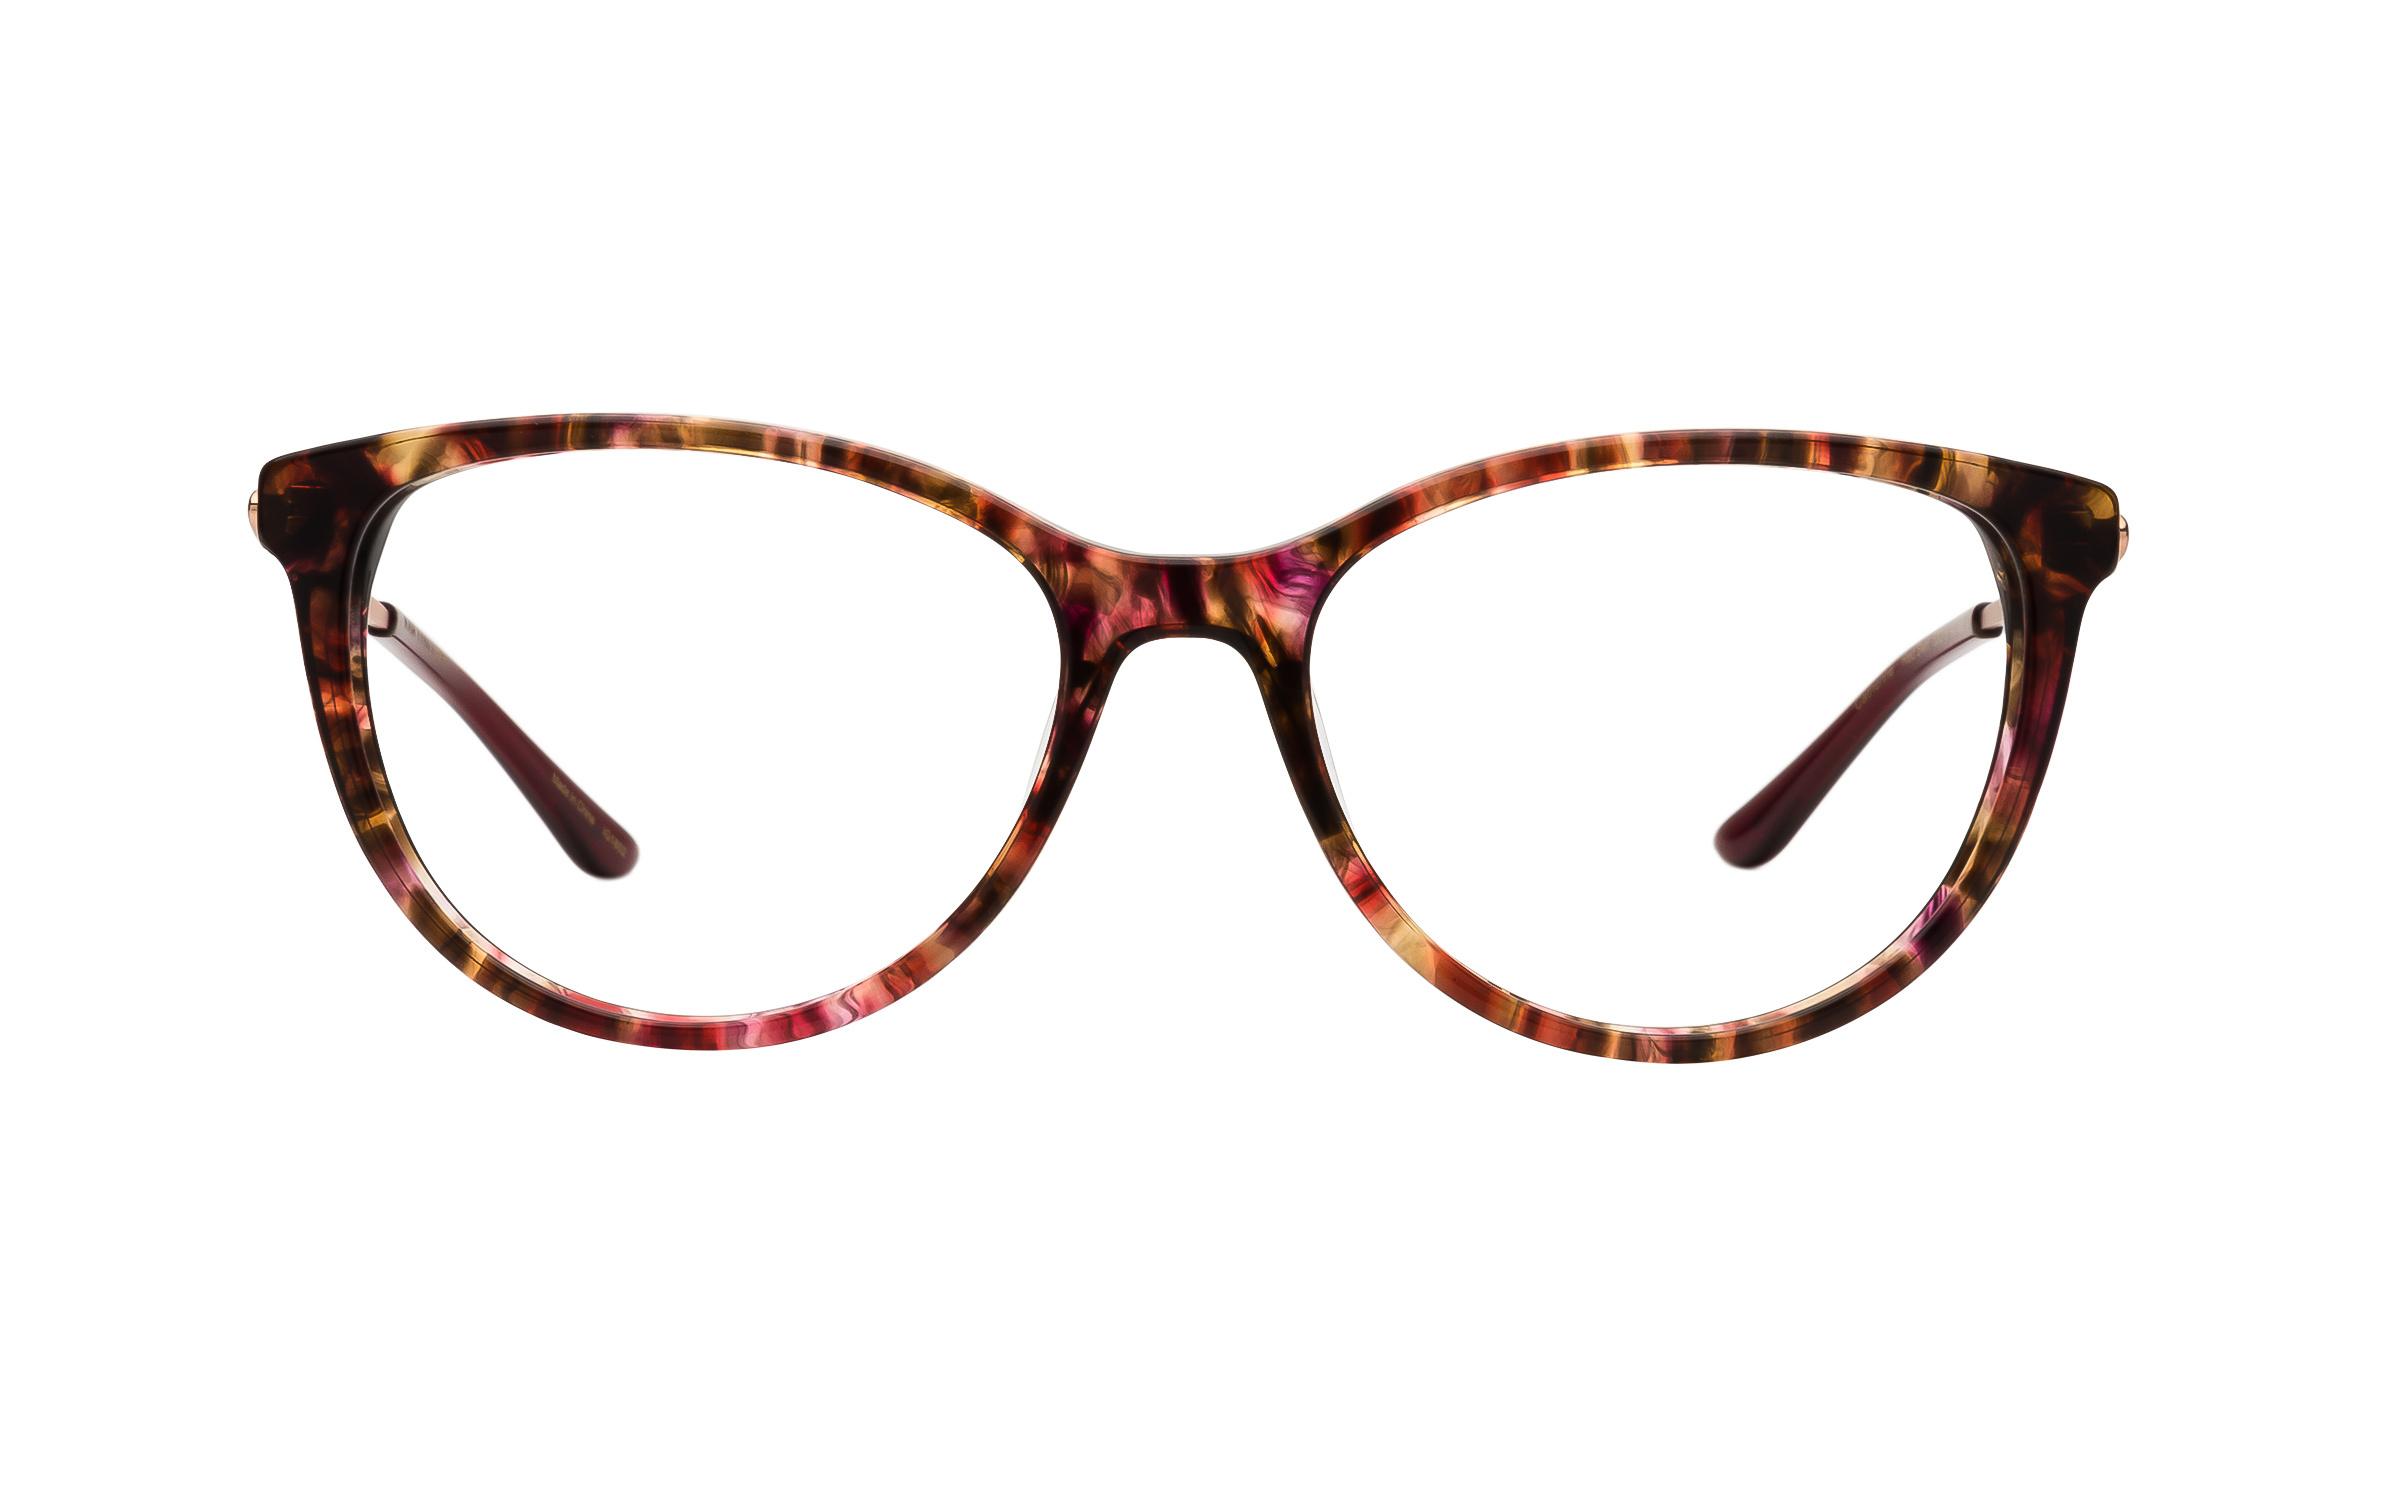 Kam Dhillon Women's Glasses Cat-Eye Tortoise/Red Acetate/Metal Online Clearly